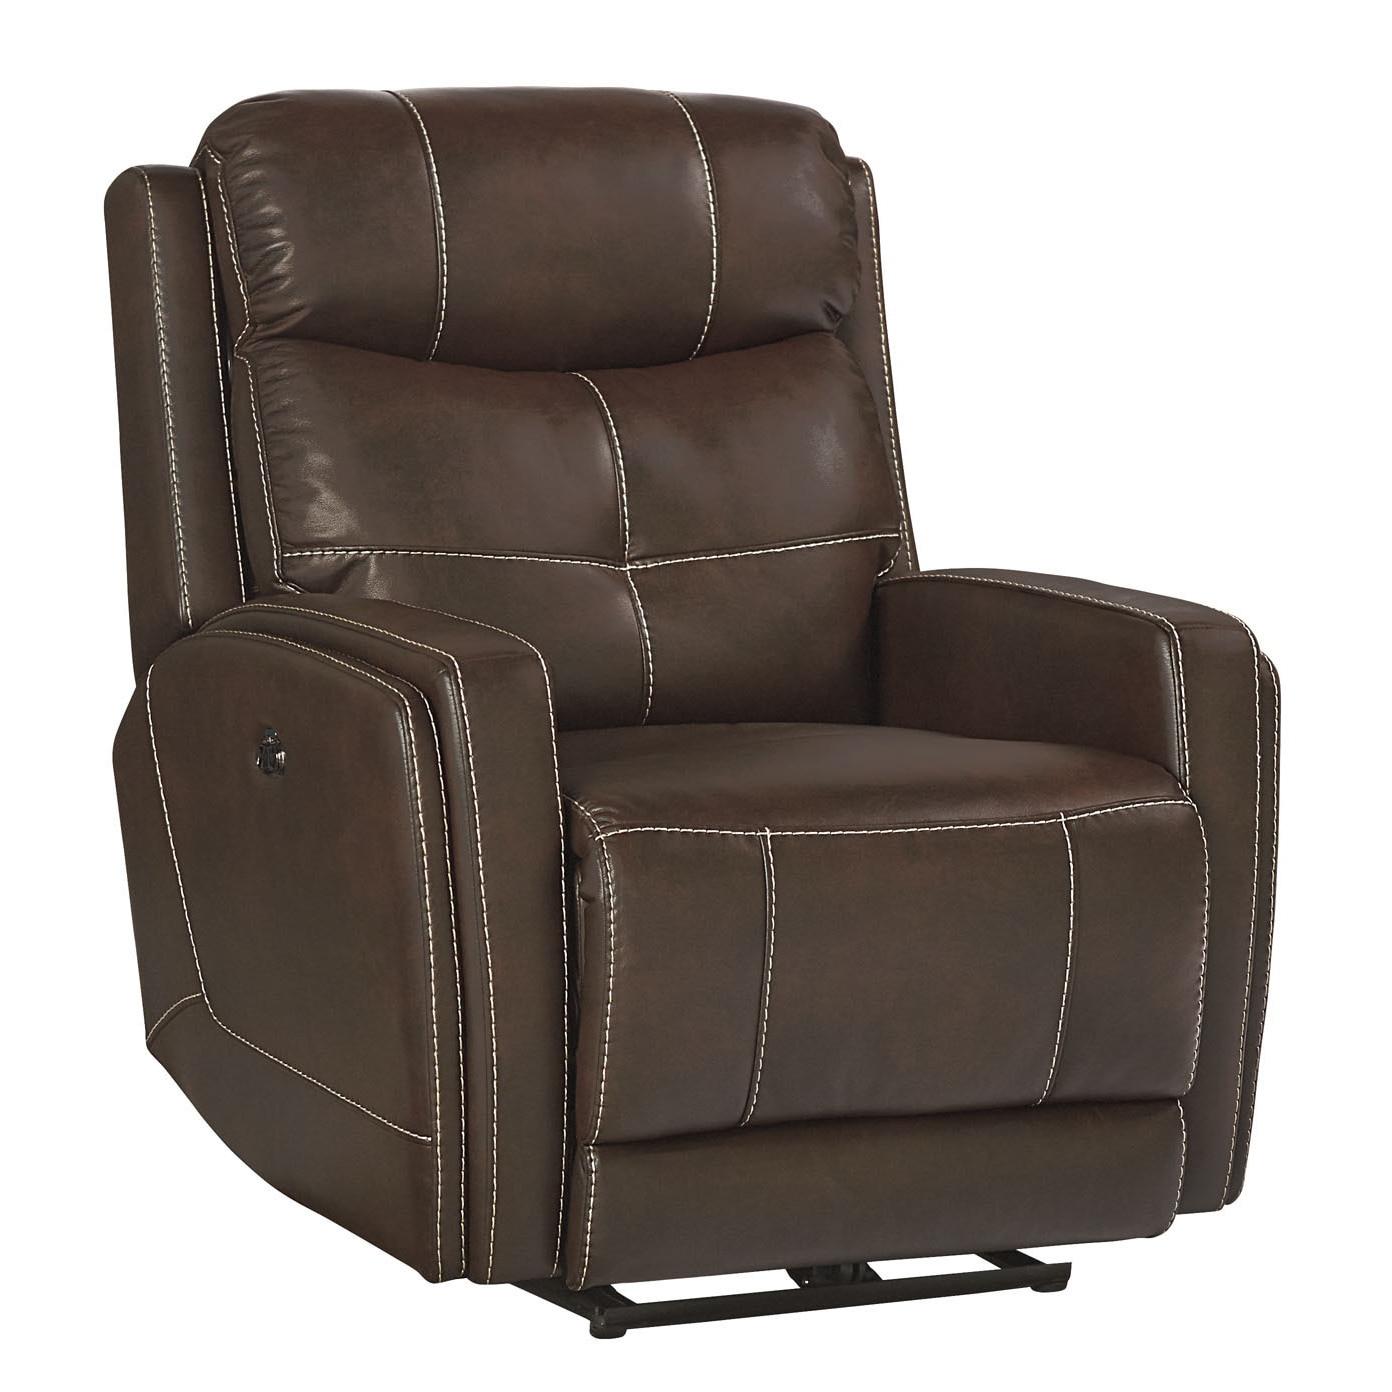 Sensational Standard Furniture Granger Brown Faux Leather Glider Recliner Machost Co Dining Chair Design Ideas Machostcouk